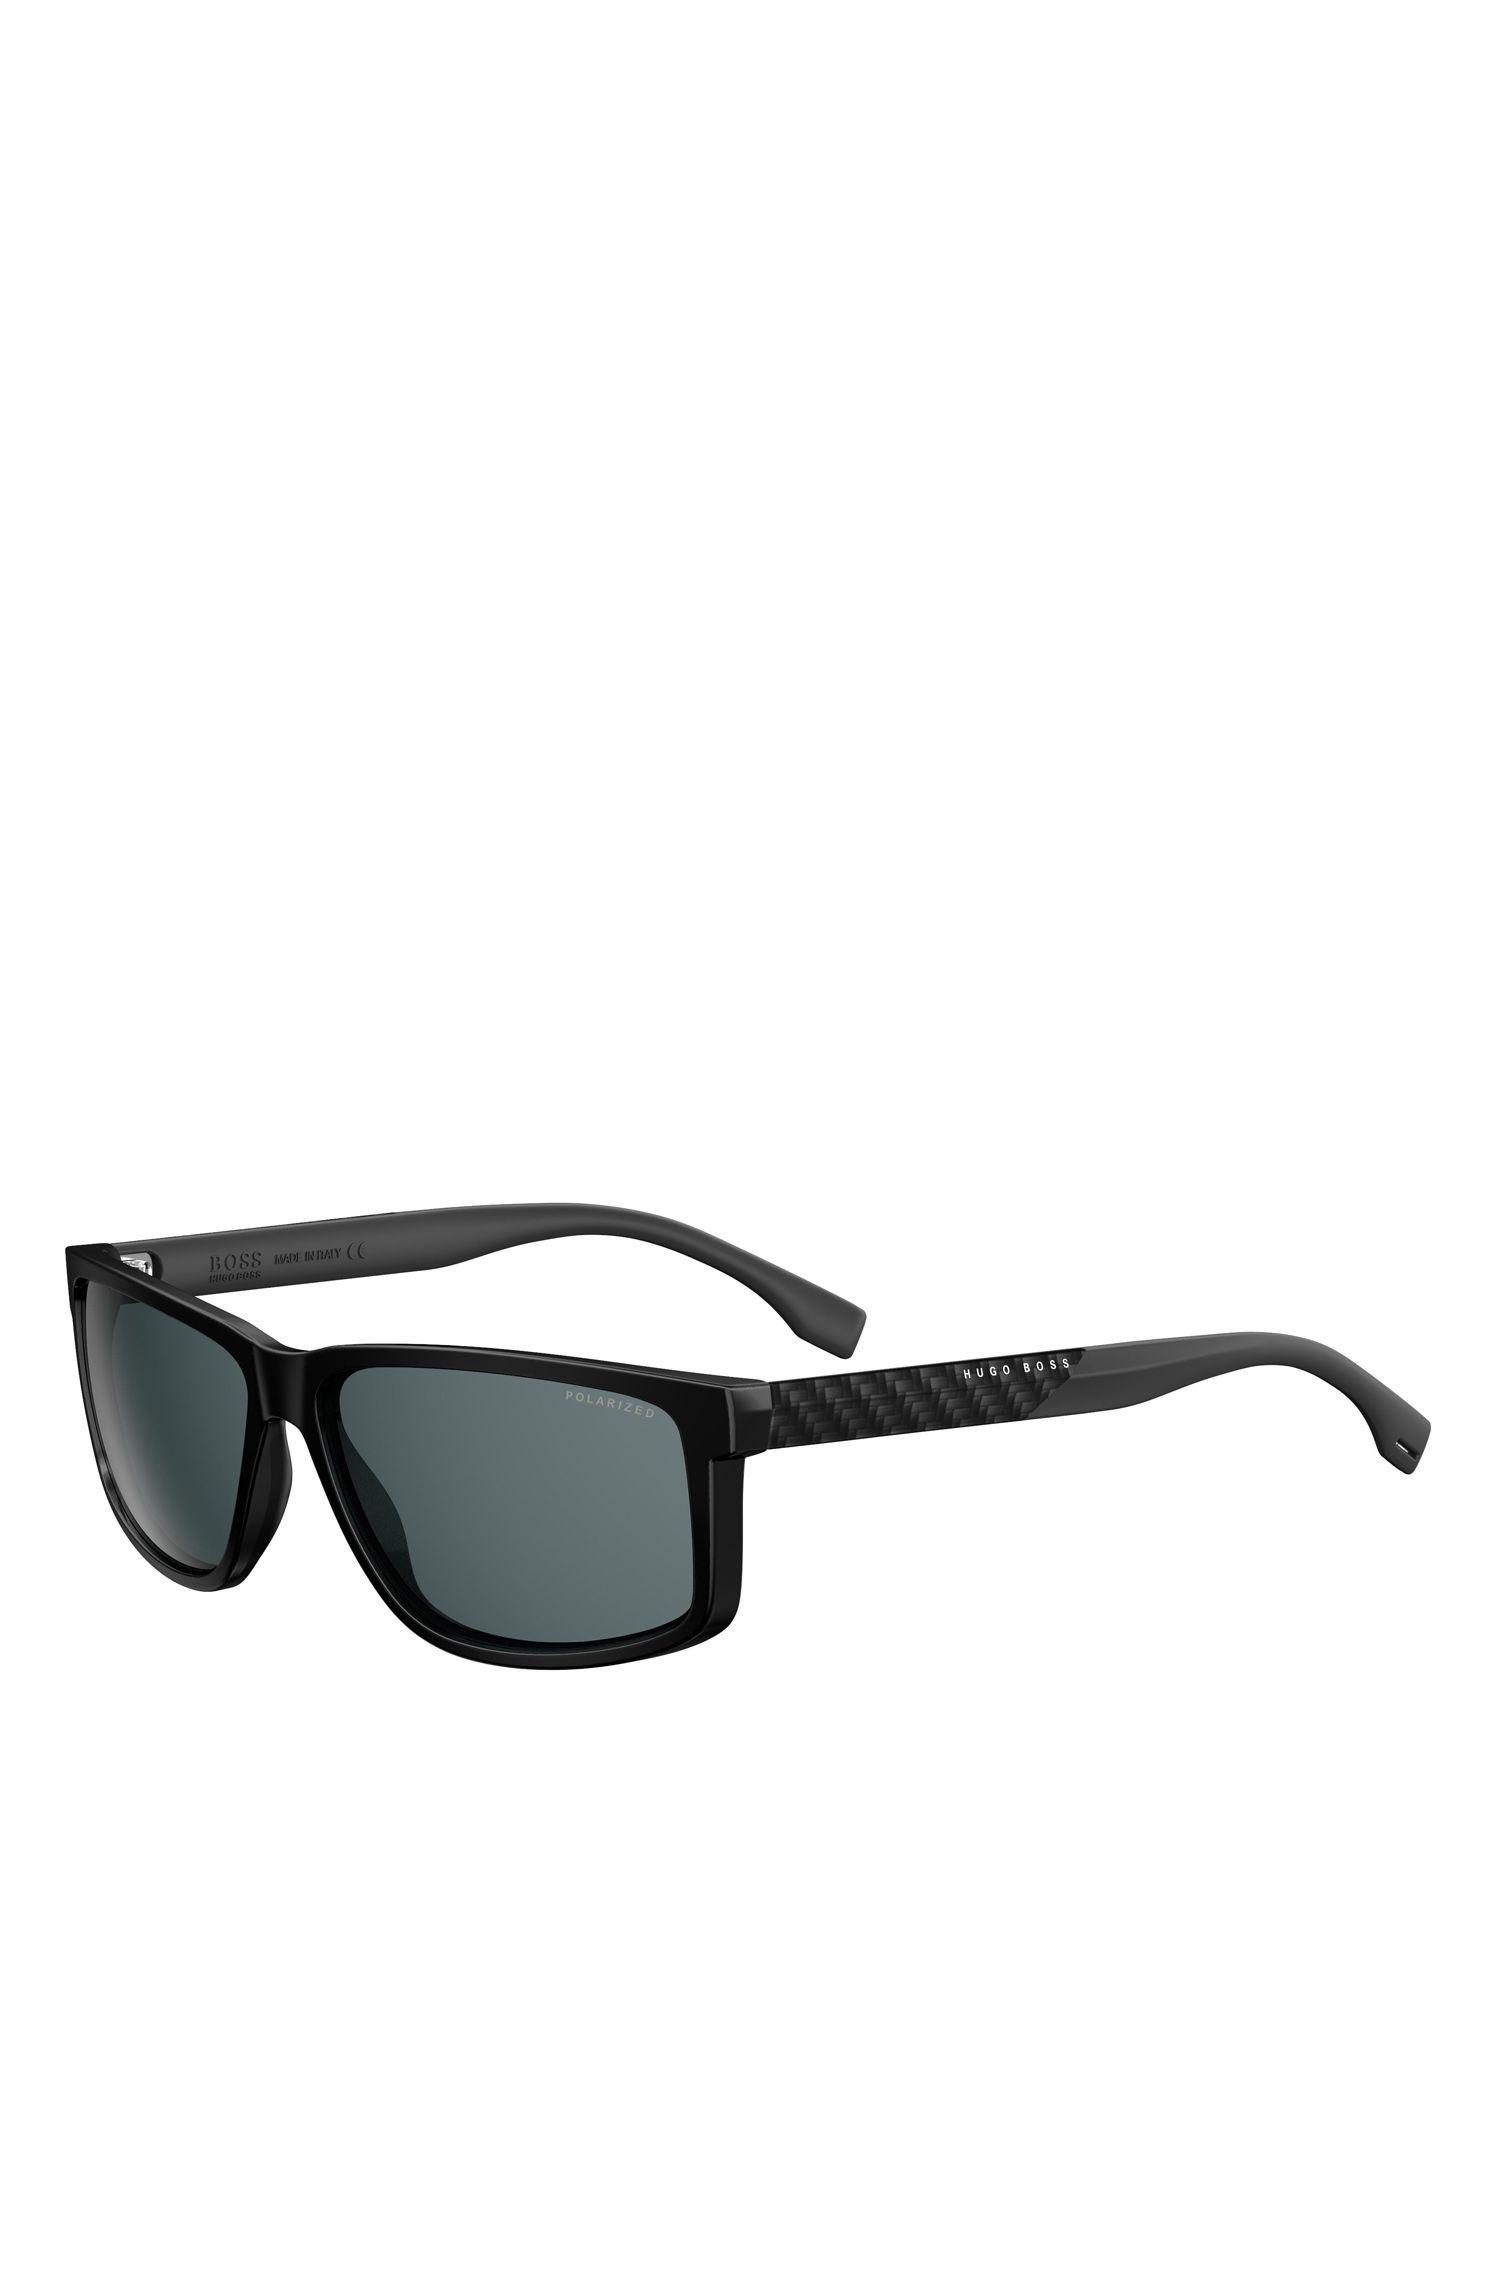 'BOSS 0879'   Dark Grey Carbon Fiber Rectangular Sunglasses